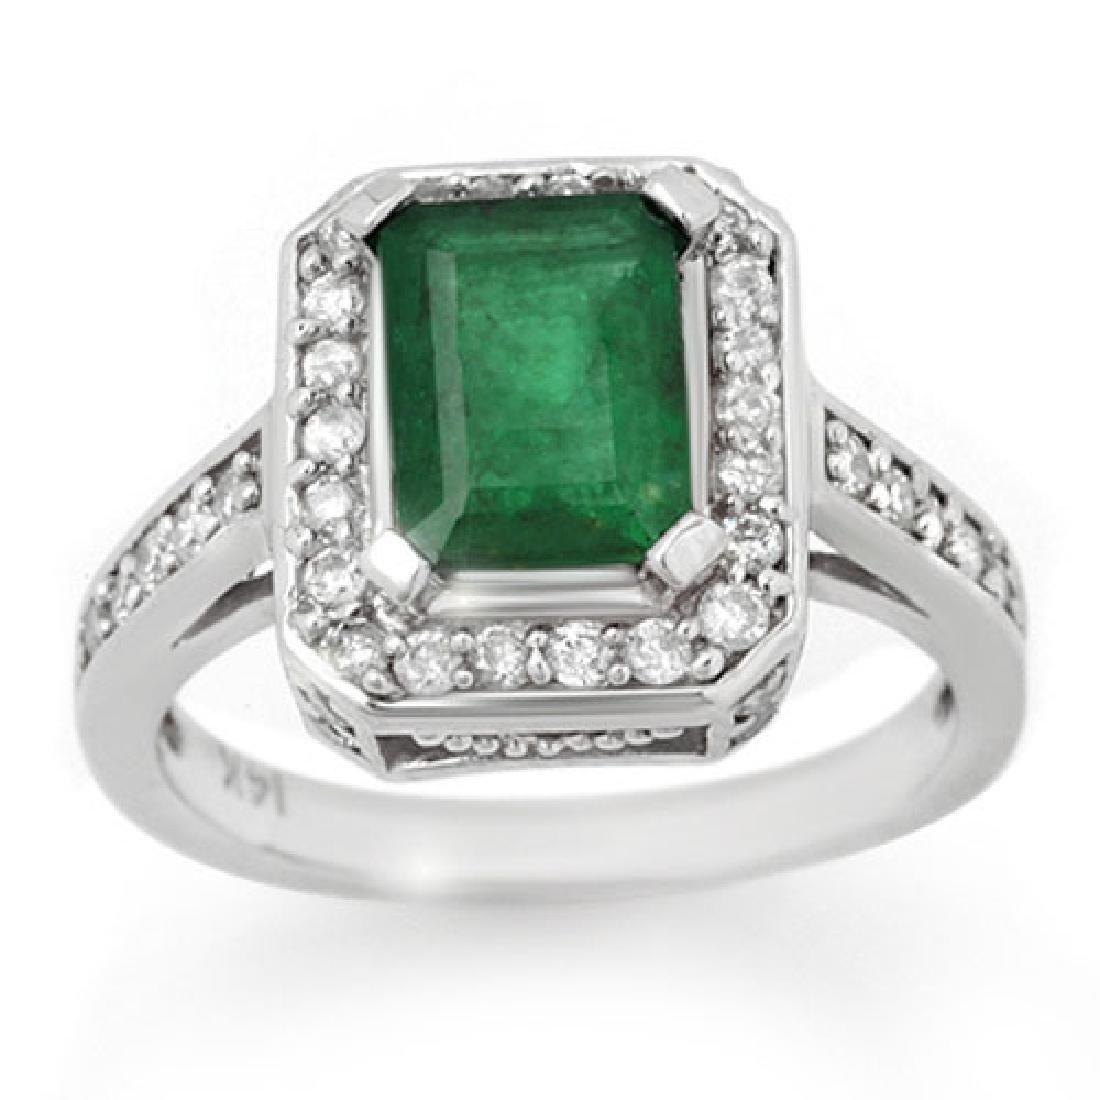 2.0 CTW Emerald & Diamond Ring 18K White Gold